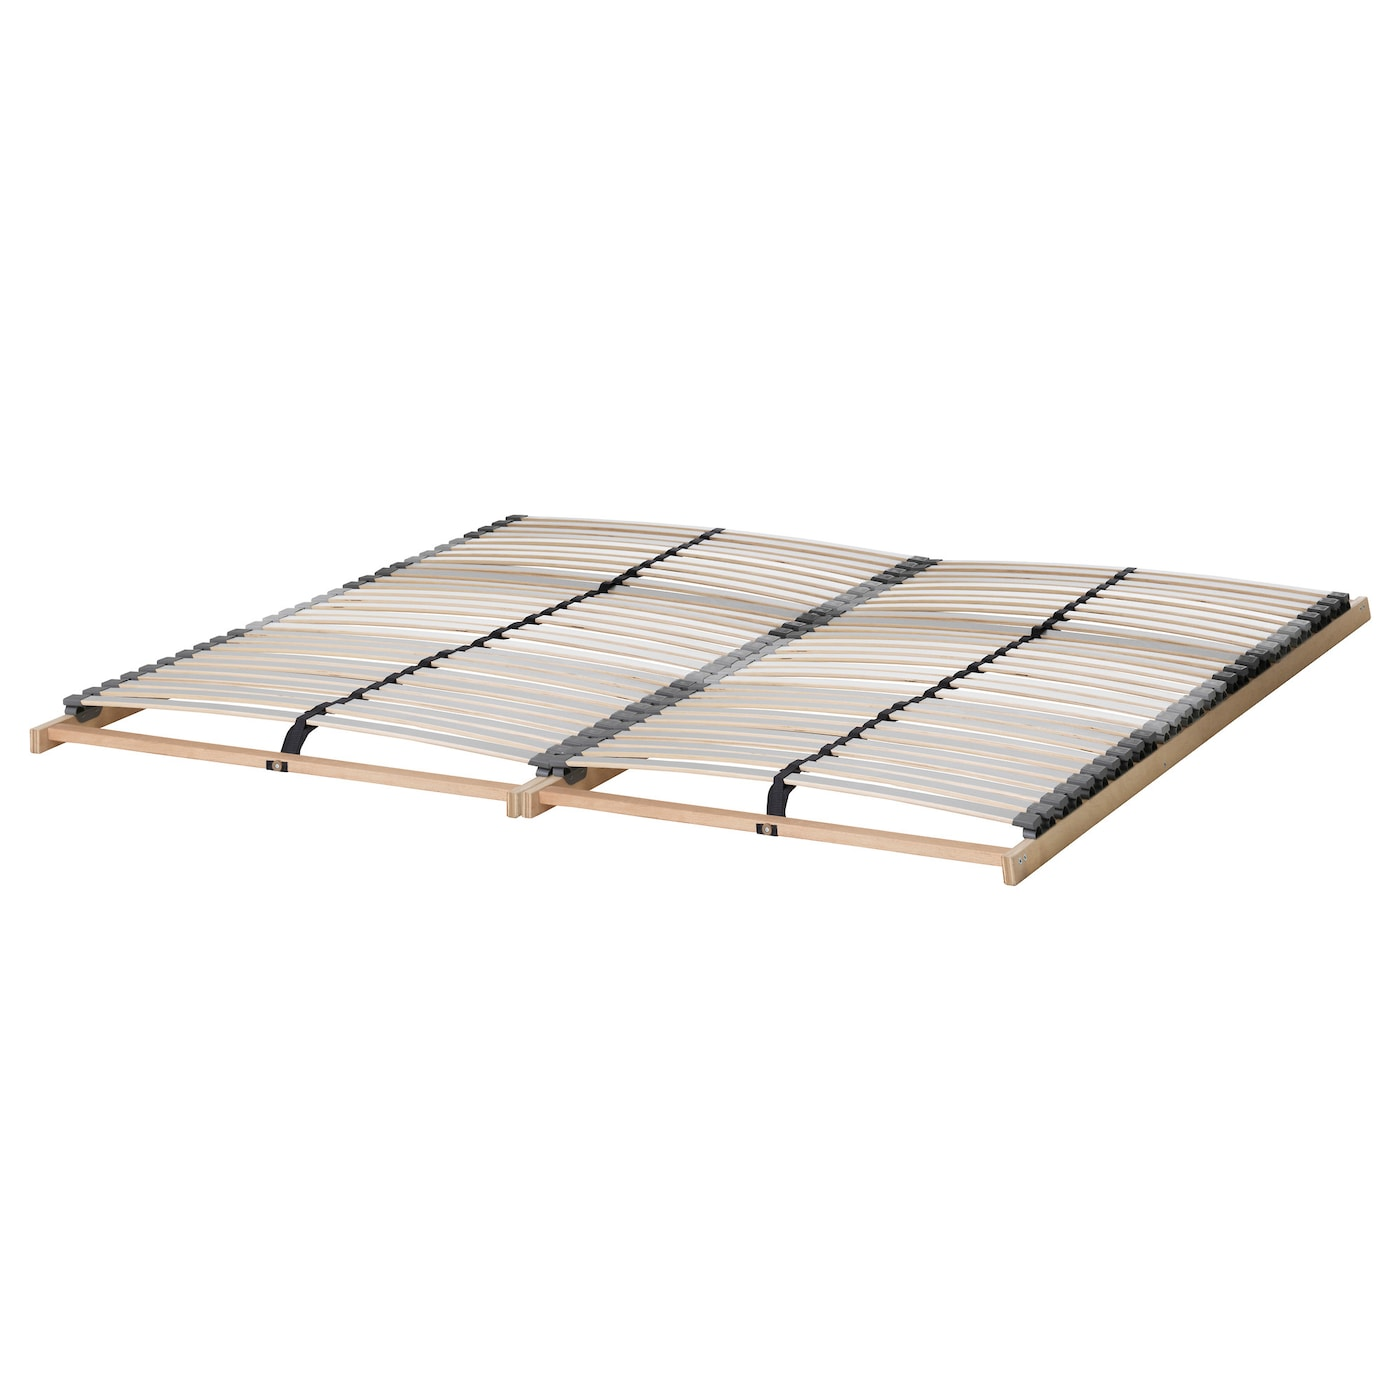 ikea brimnes bed. IKEA BRIMNES Bed Frame W Storage And Headboard Ikea Brimnes L